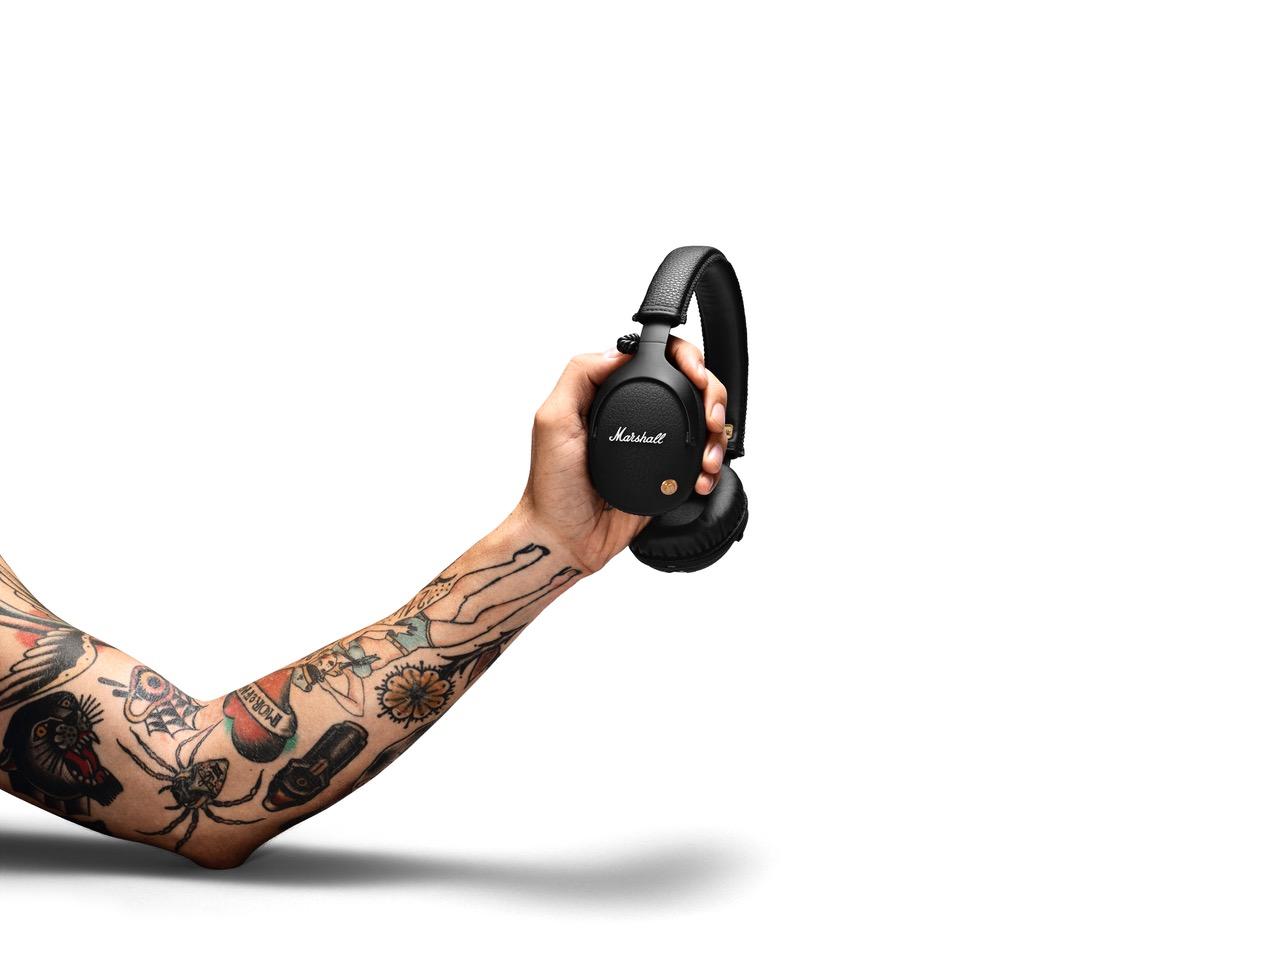 Marshall Kopfhörer mit Bluetooth